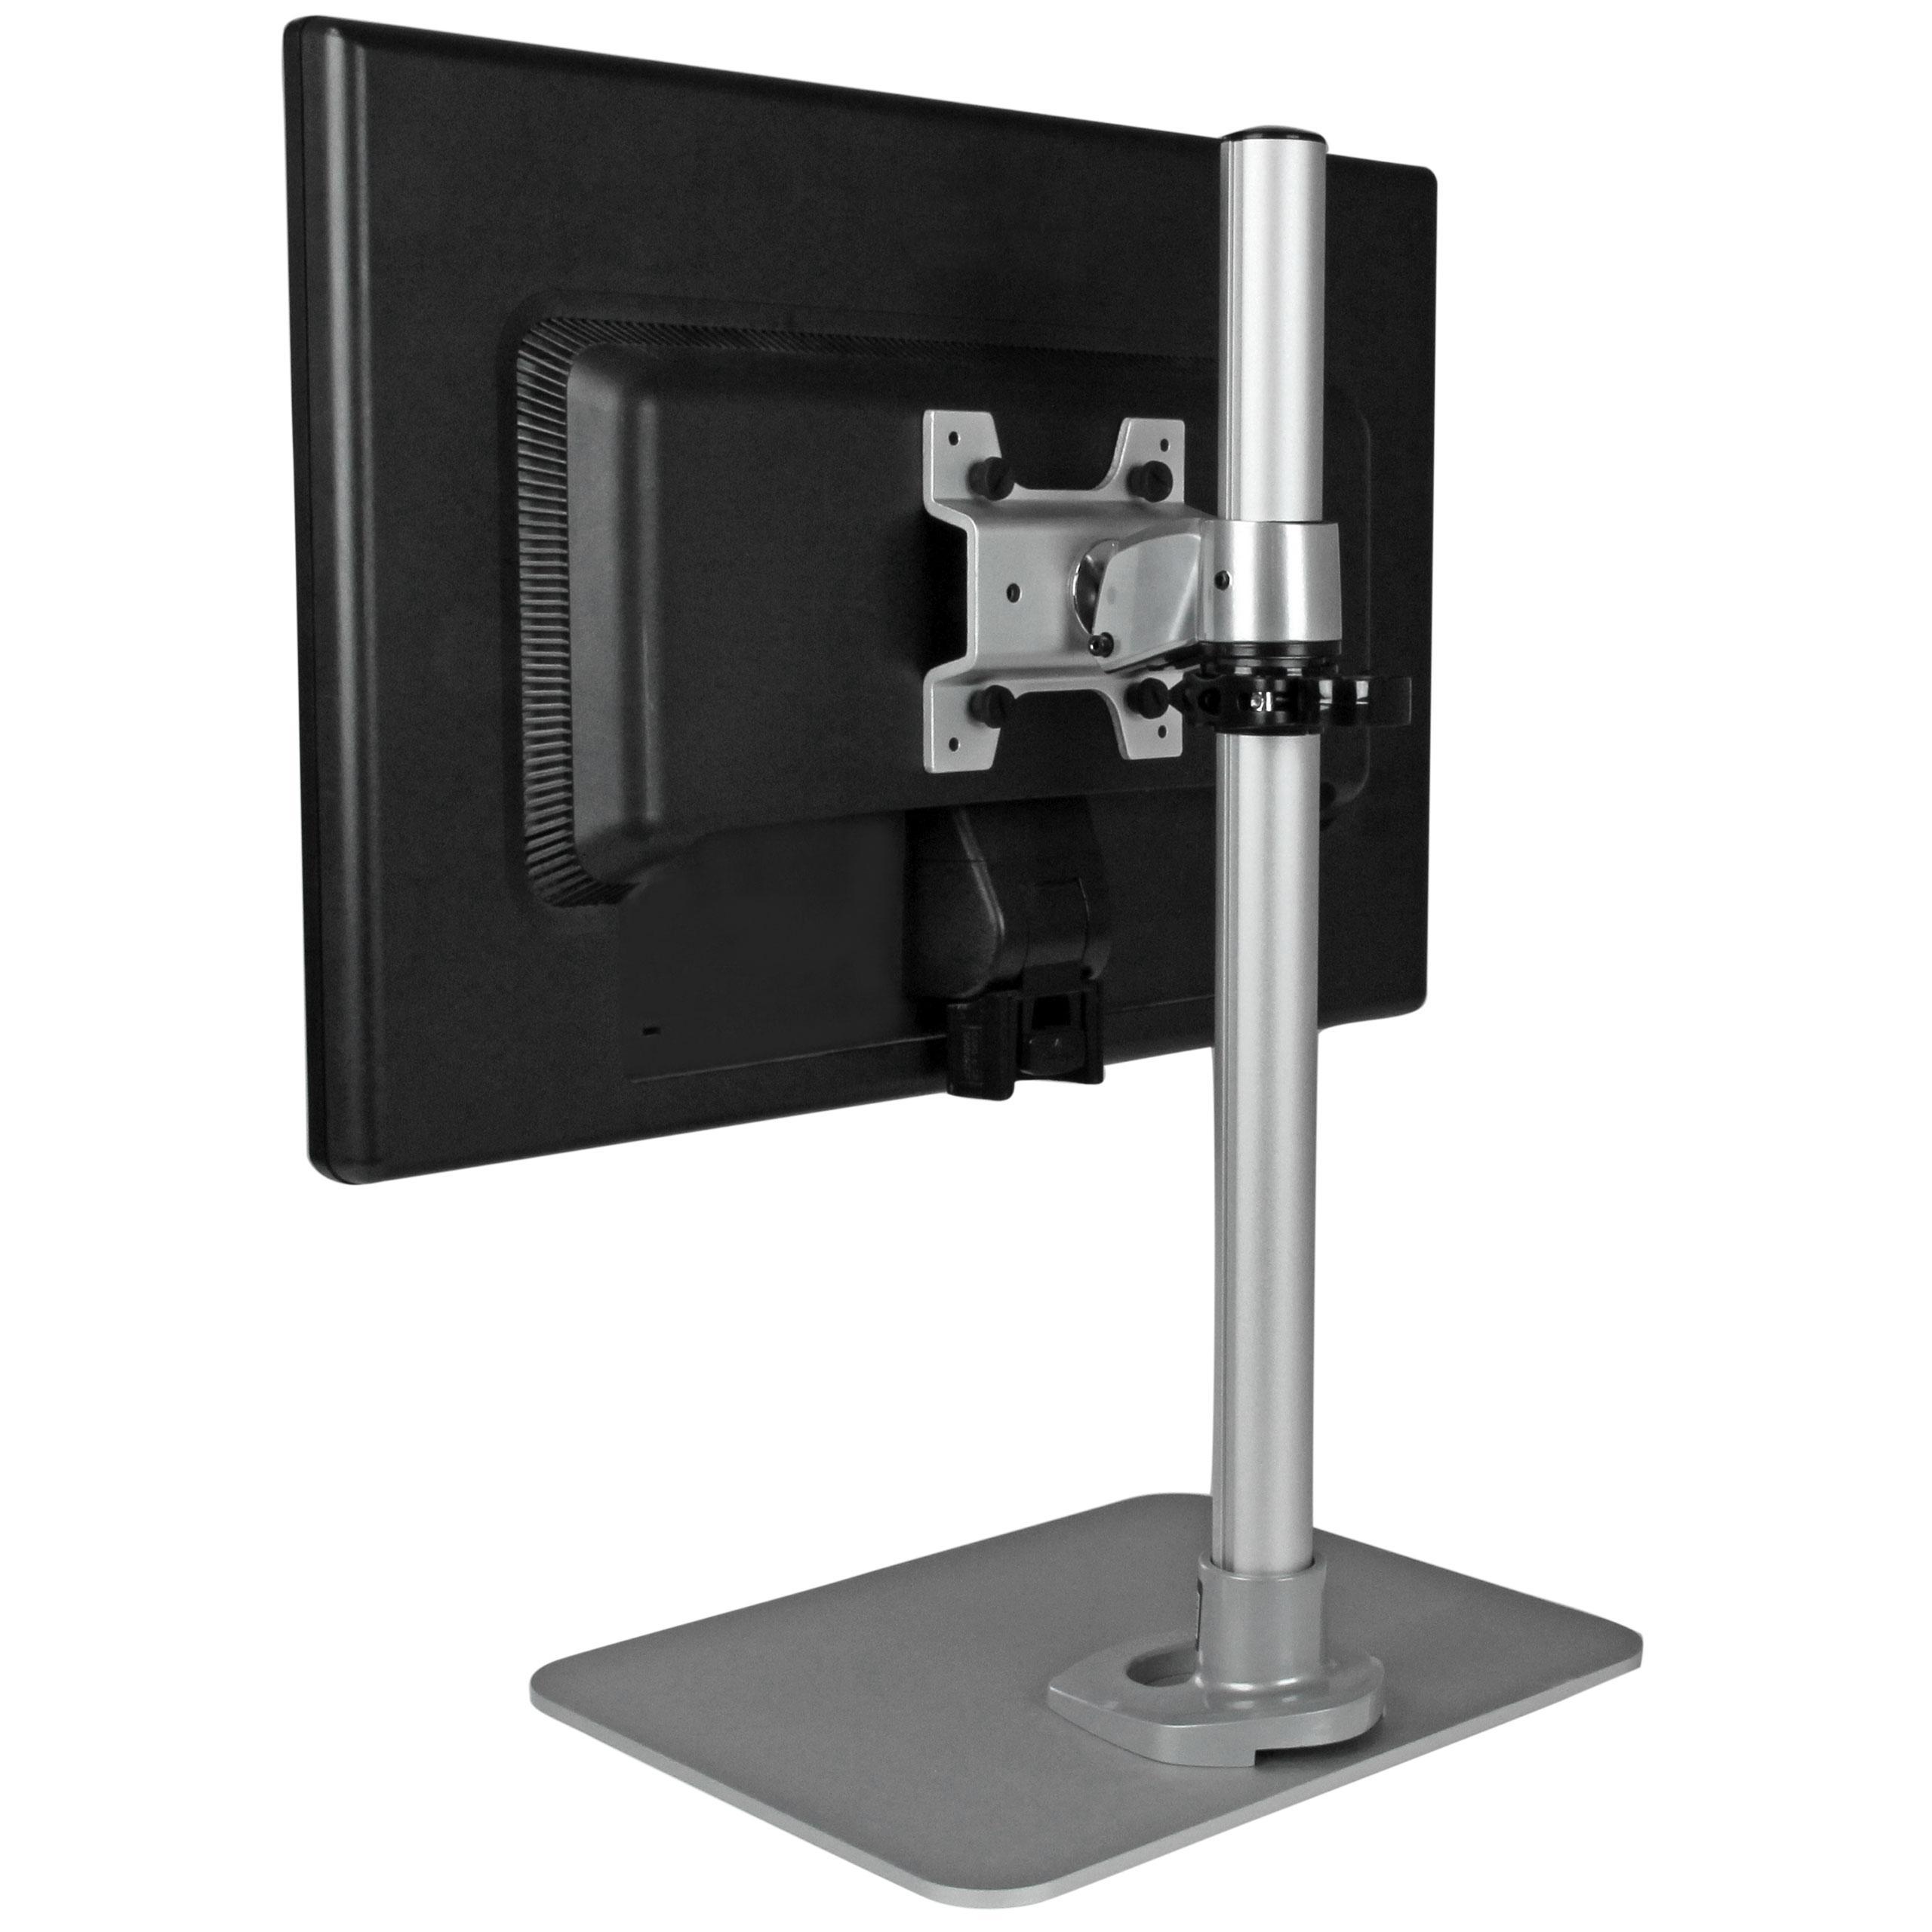 Amazoncom StarTechcom Single Monitor Stand  Silver